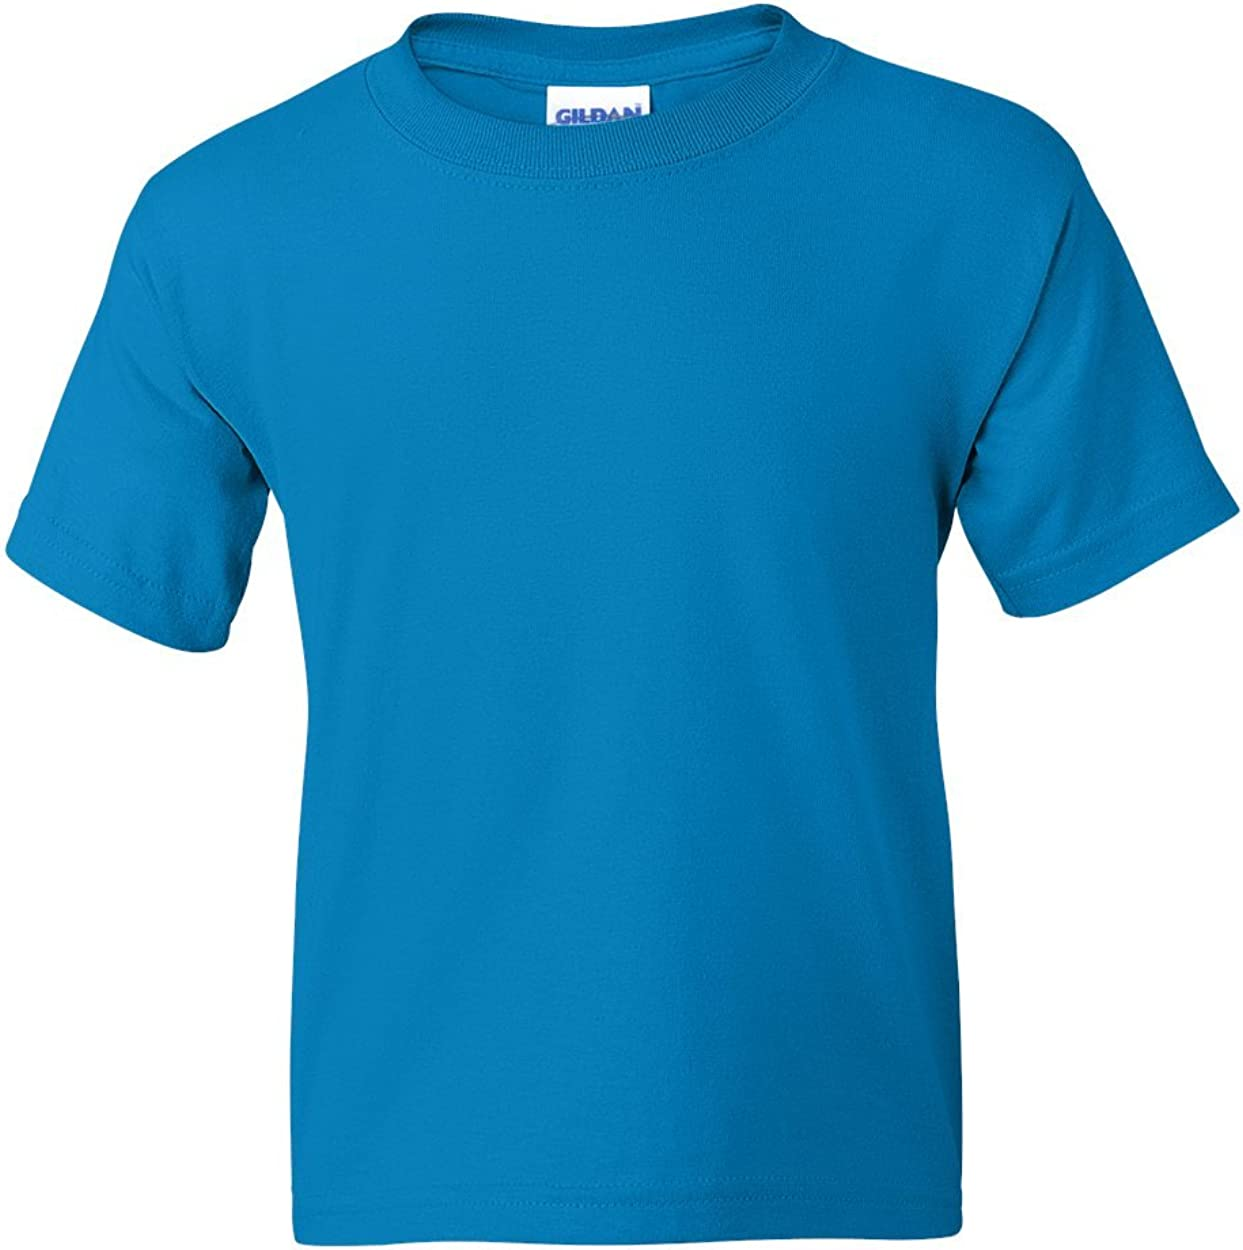 Gildan Classic Fit Youth T-Shirt, Sapphire, Small